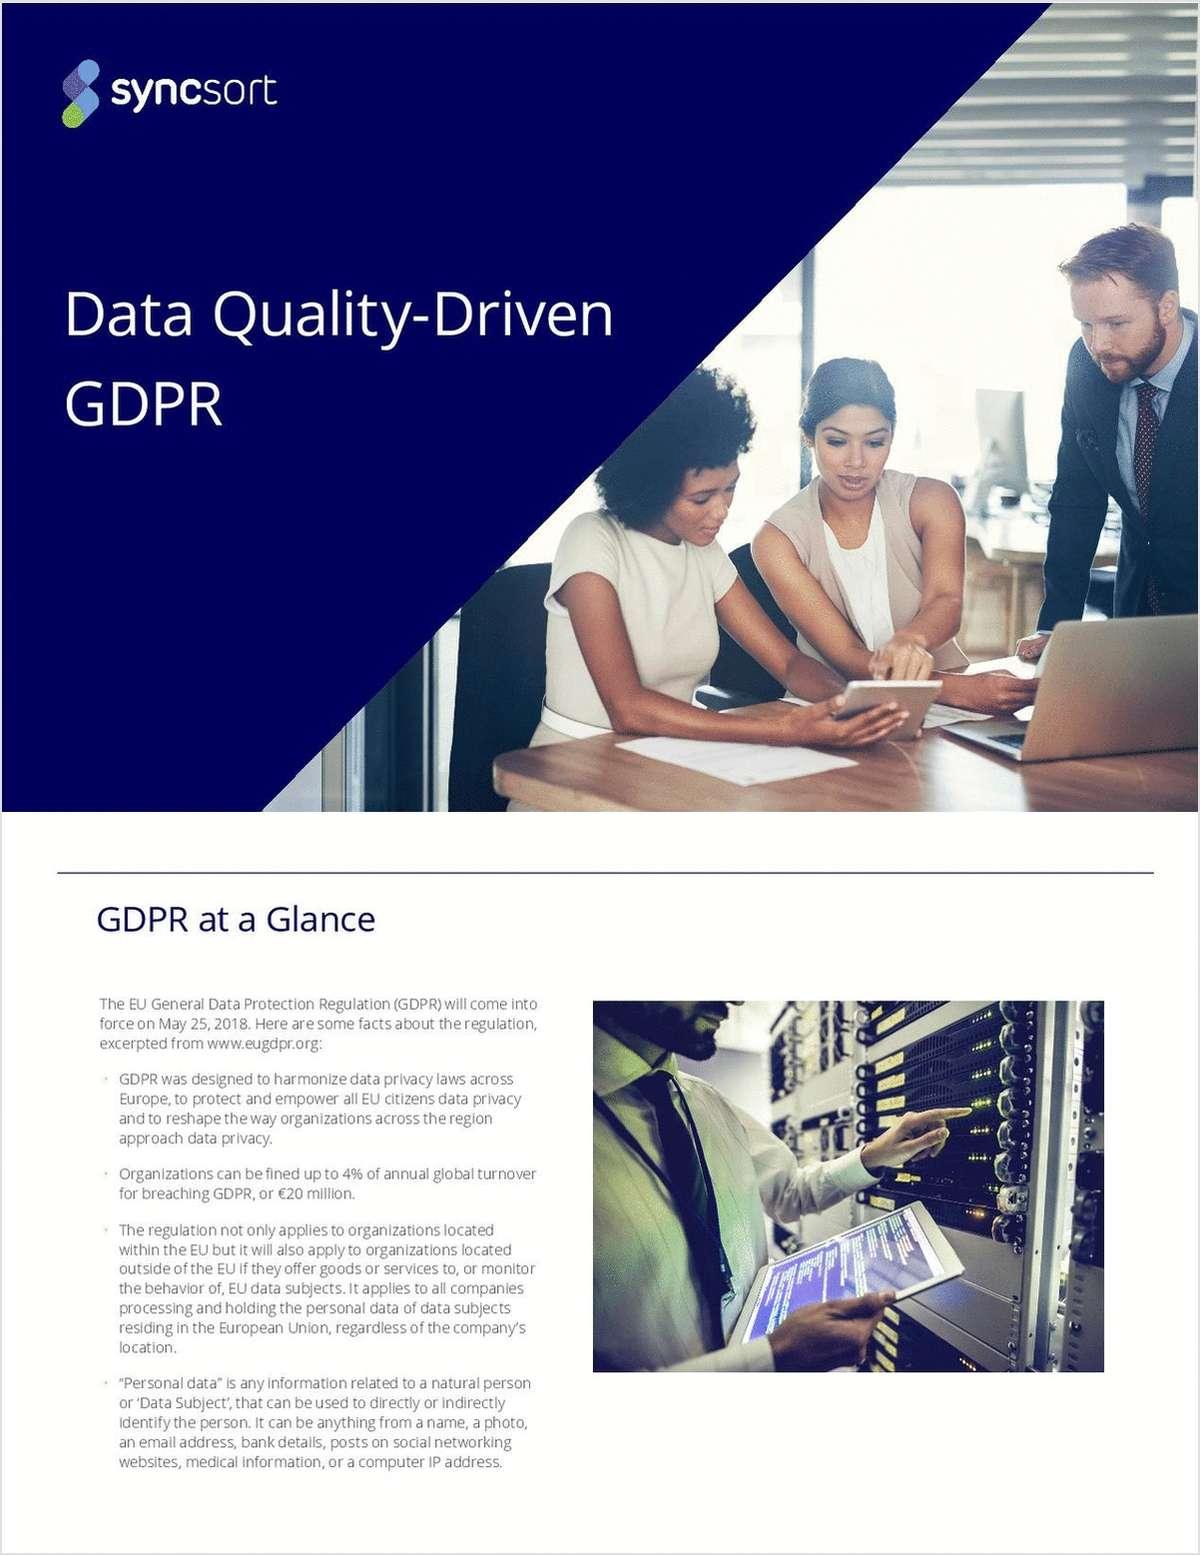 Data Quality-Driven GDPR